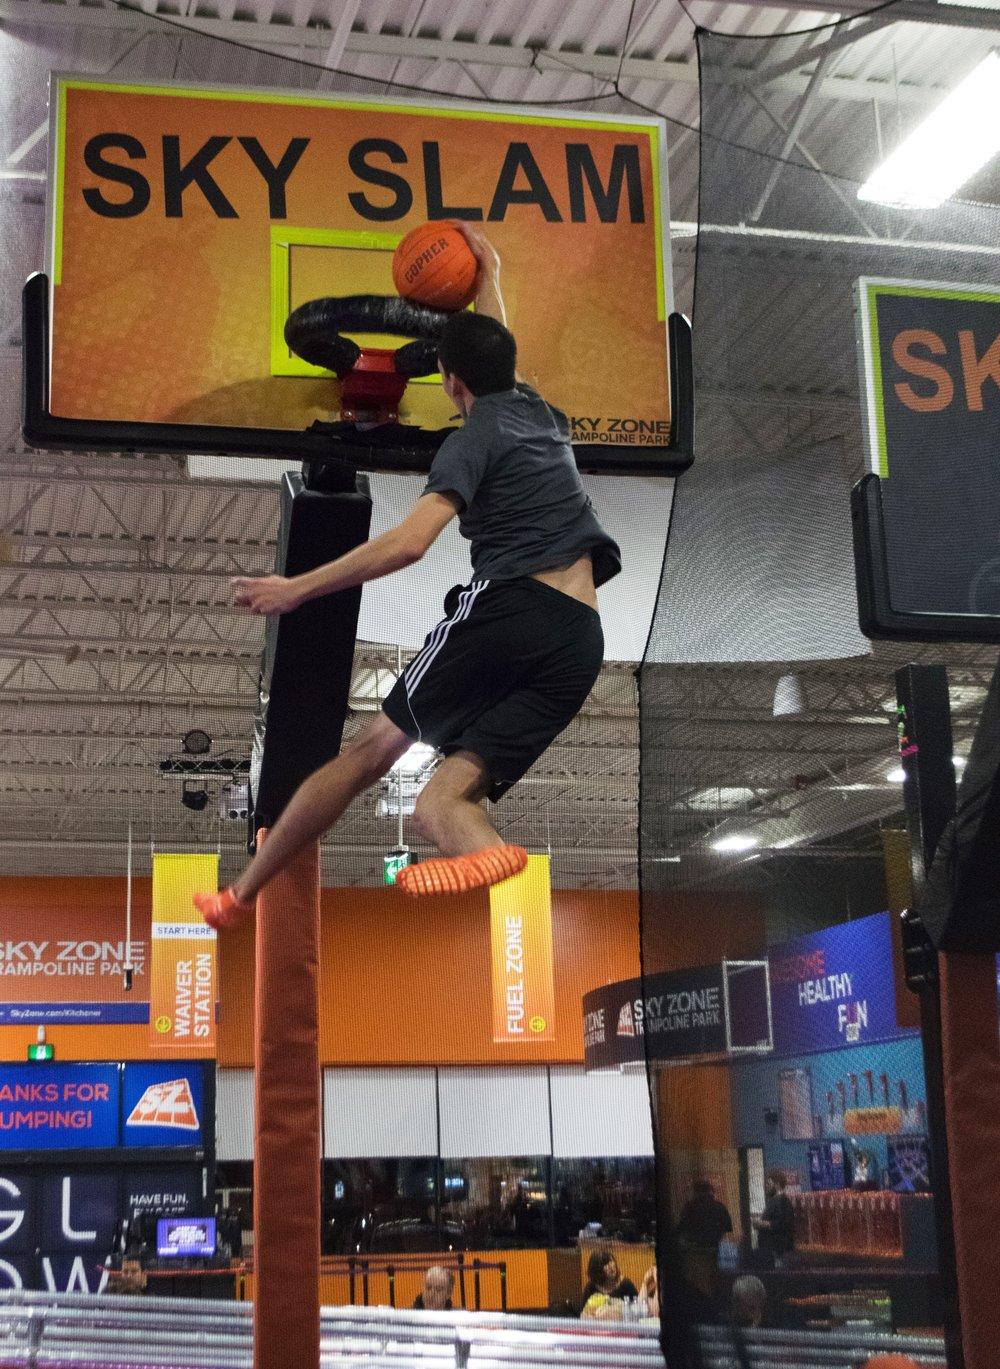 Man Dunking Basketball at Sky Zone